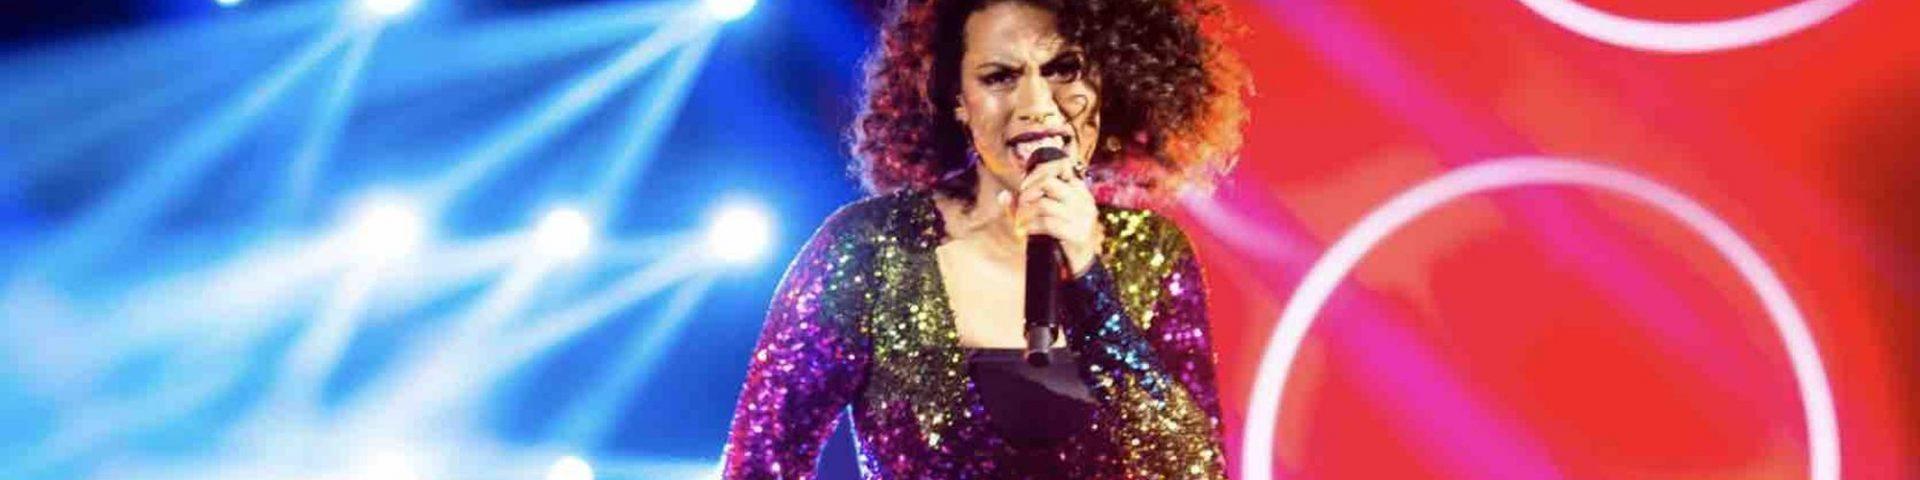 X Factor 12, Sherol Dos Santos eliminata al sesto Live - Riassunto